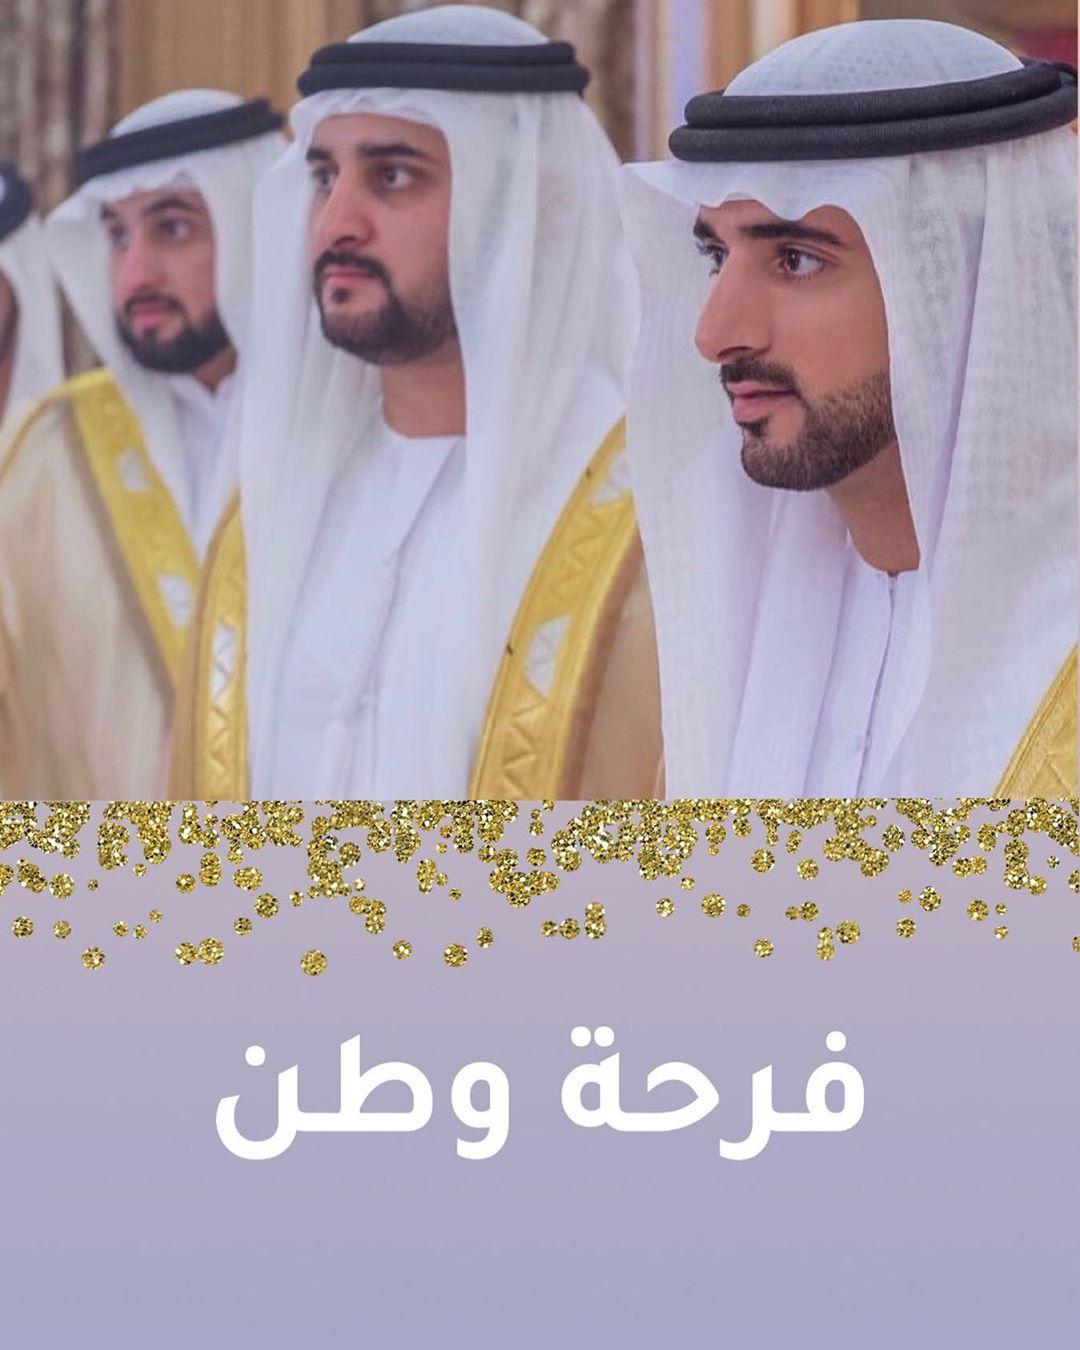 Sheikh Hamdan Wife Photos : sheikh, hamdan, photos, Dubai, Crown, Prince, Sheikh, Hamdan, Married, Esquire, Middle